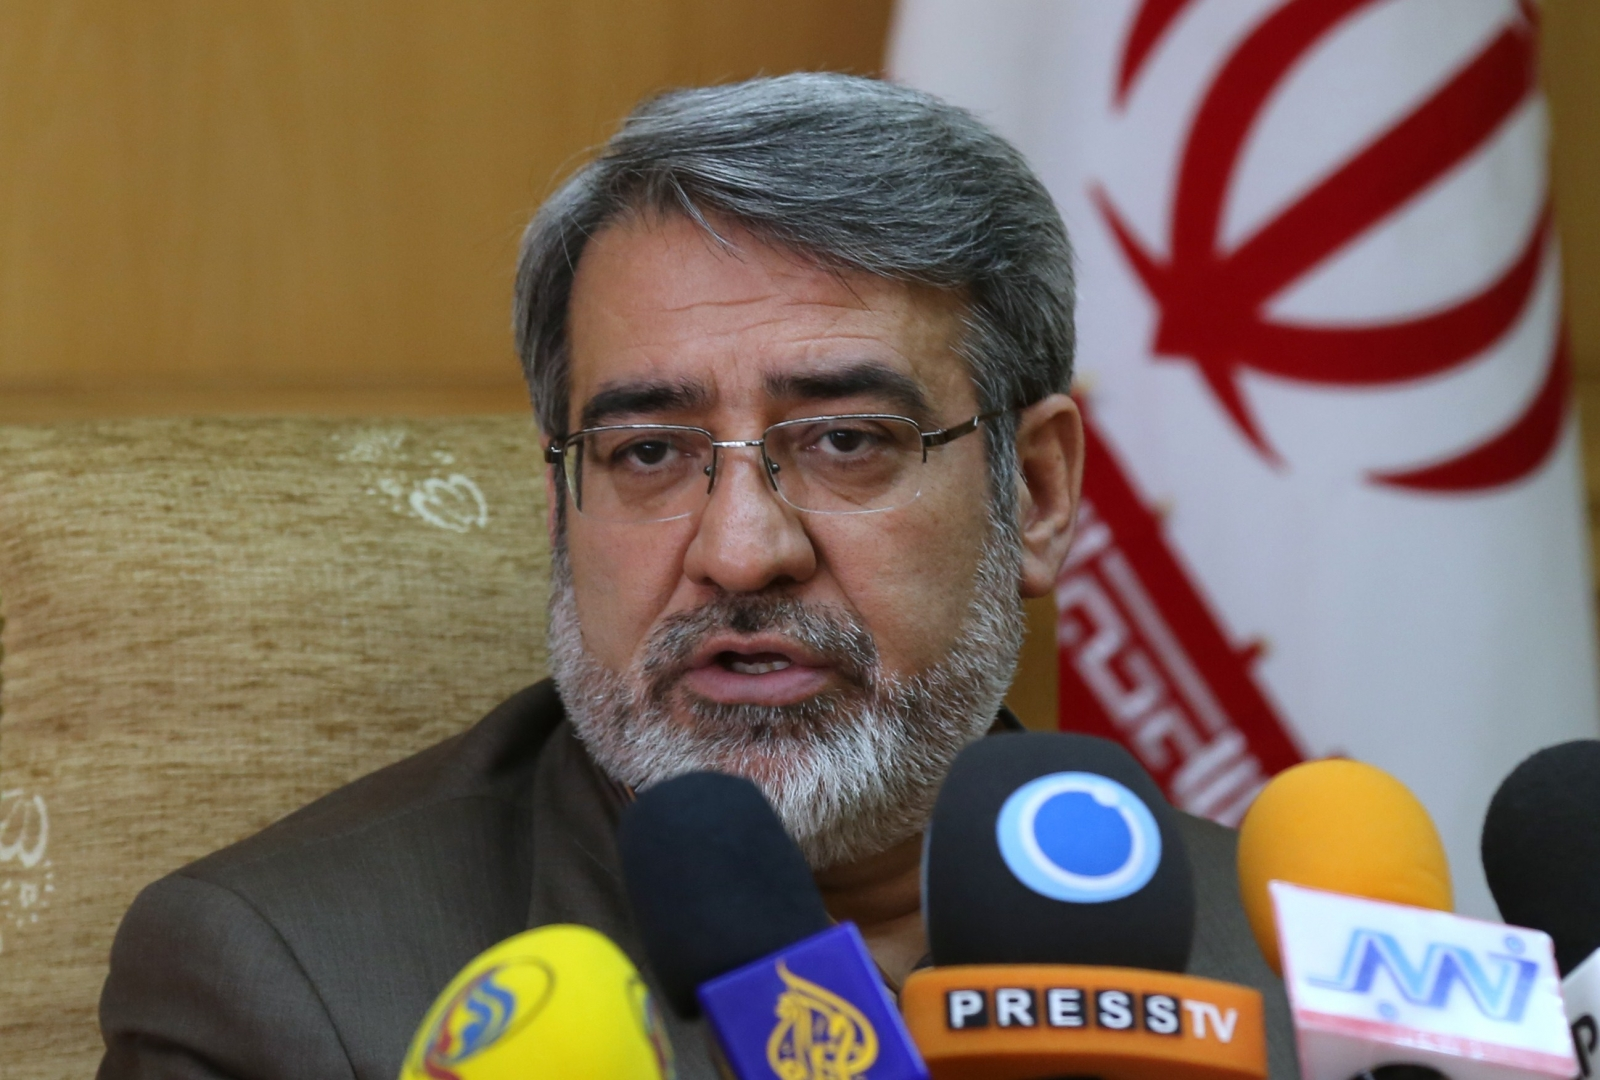 Interior Minister Abdolreza Rahmani Fazli